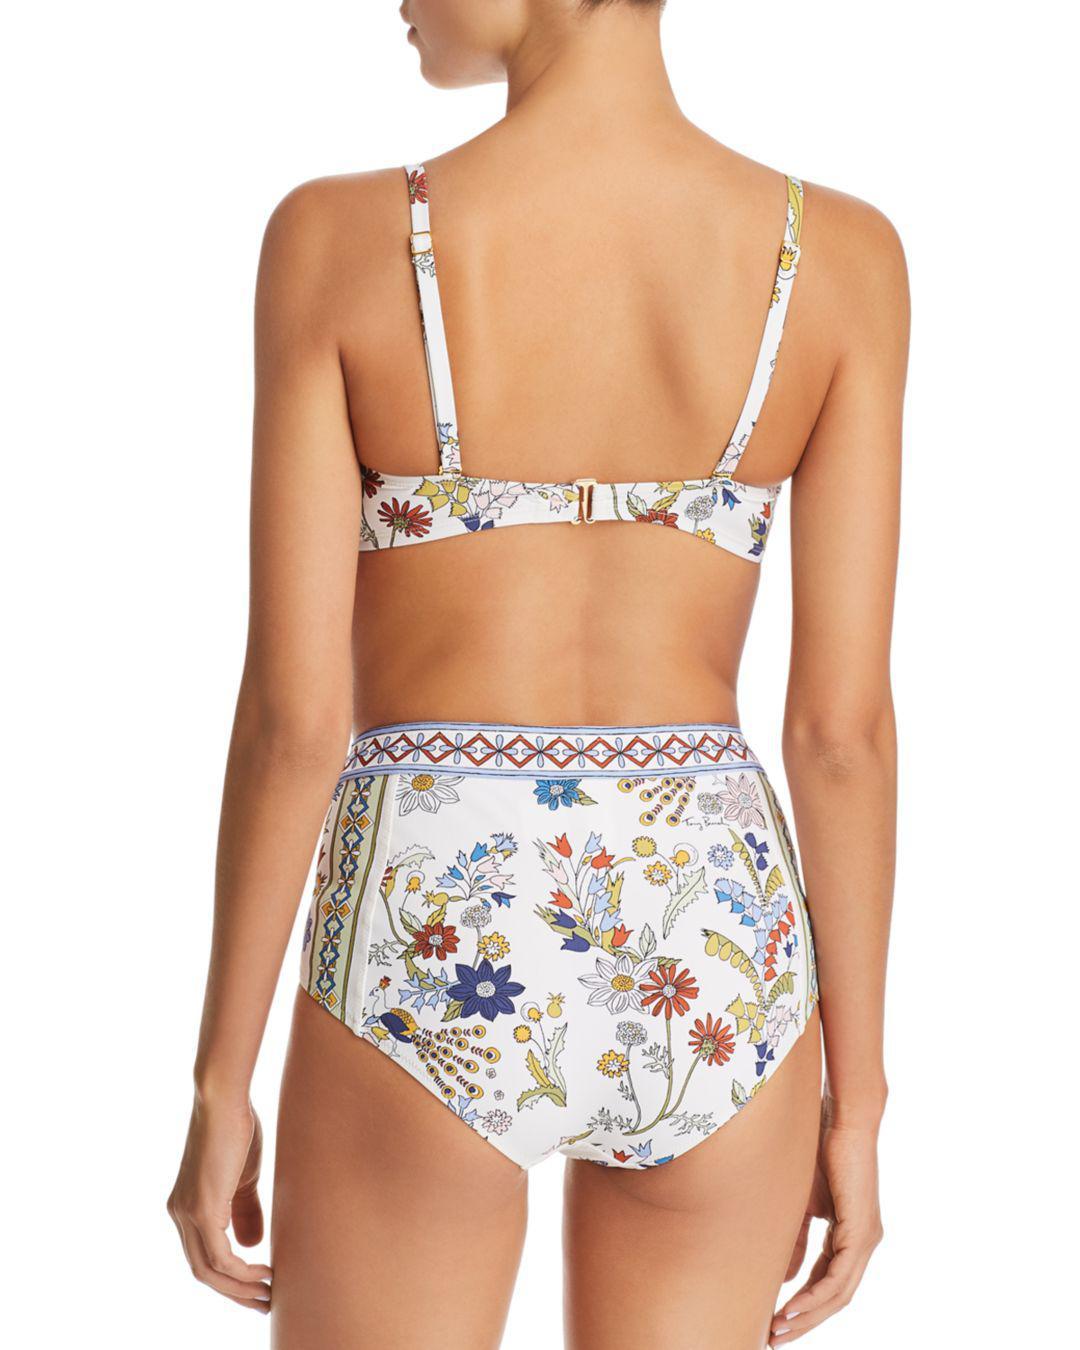 a09b3a5ce495 Tory Burch - Multicolor Meadow Folly High-waist Bikini Bottom - Lyst. View  fullscreen